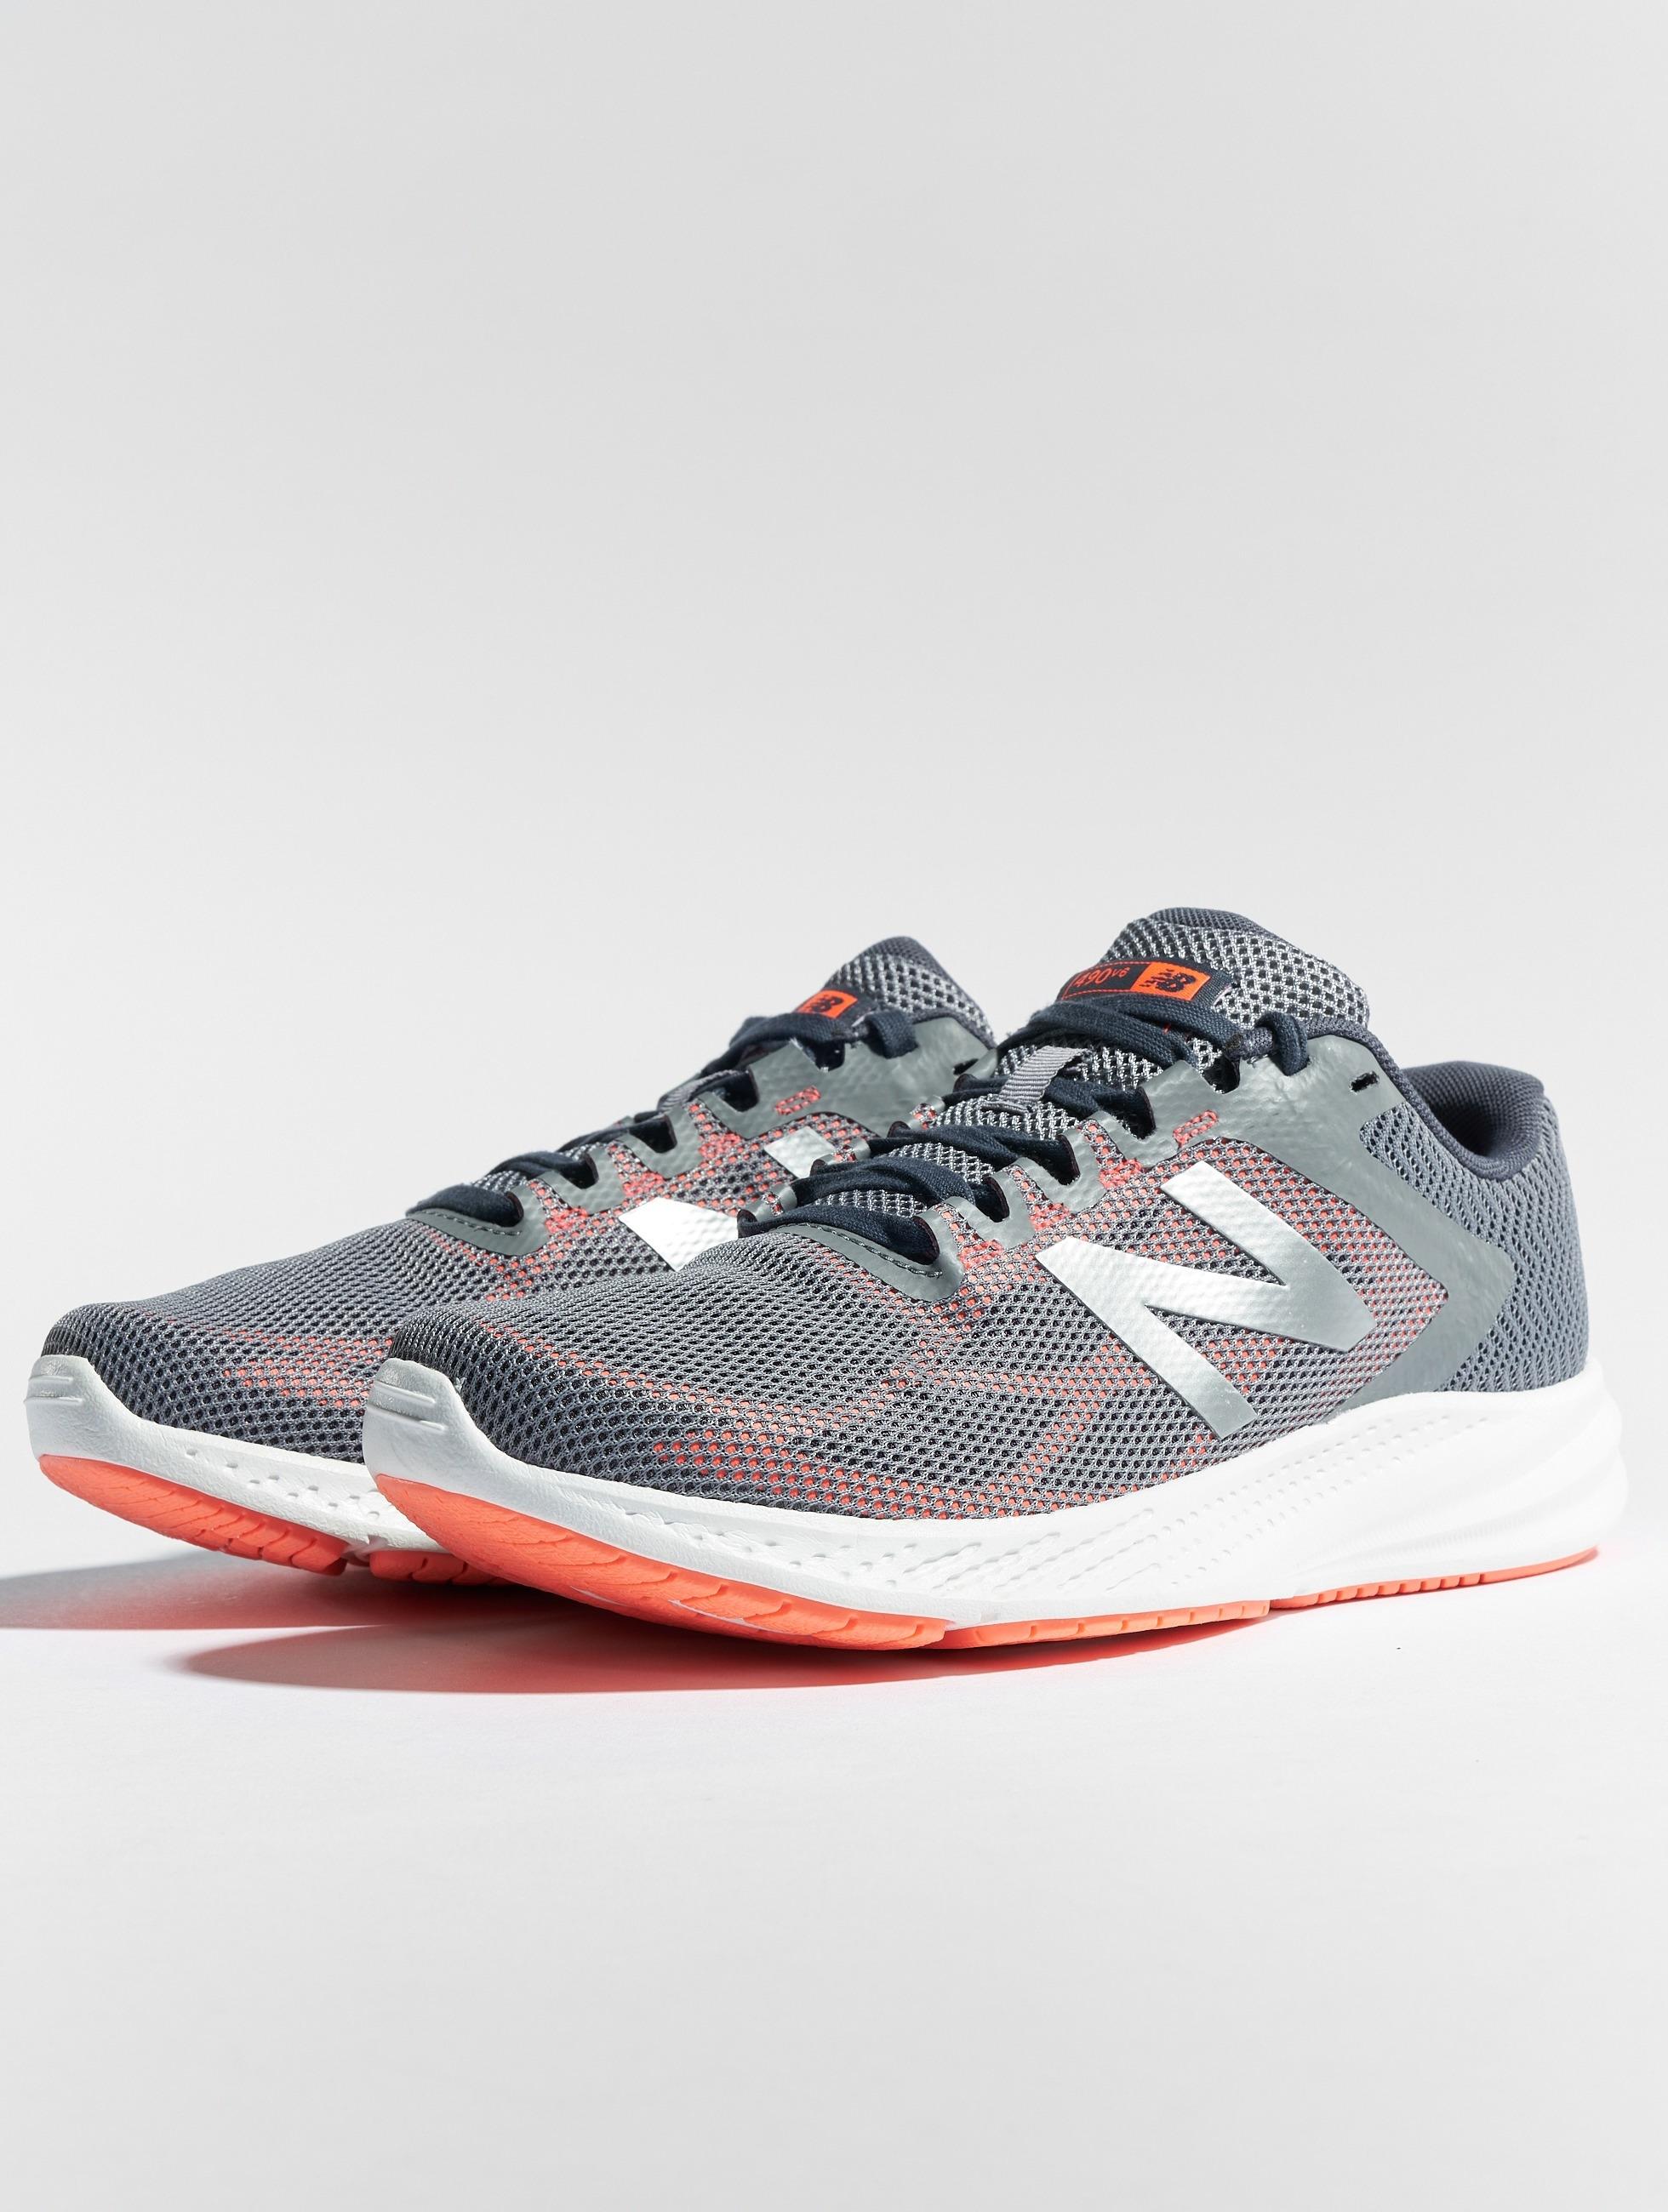 W490 Sneakers New Balance Gunmetal nO80wPNyvm